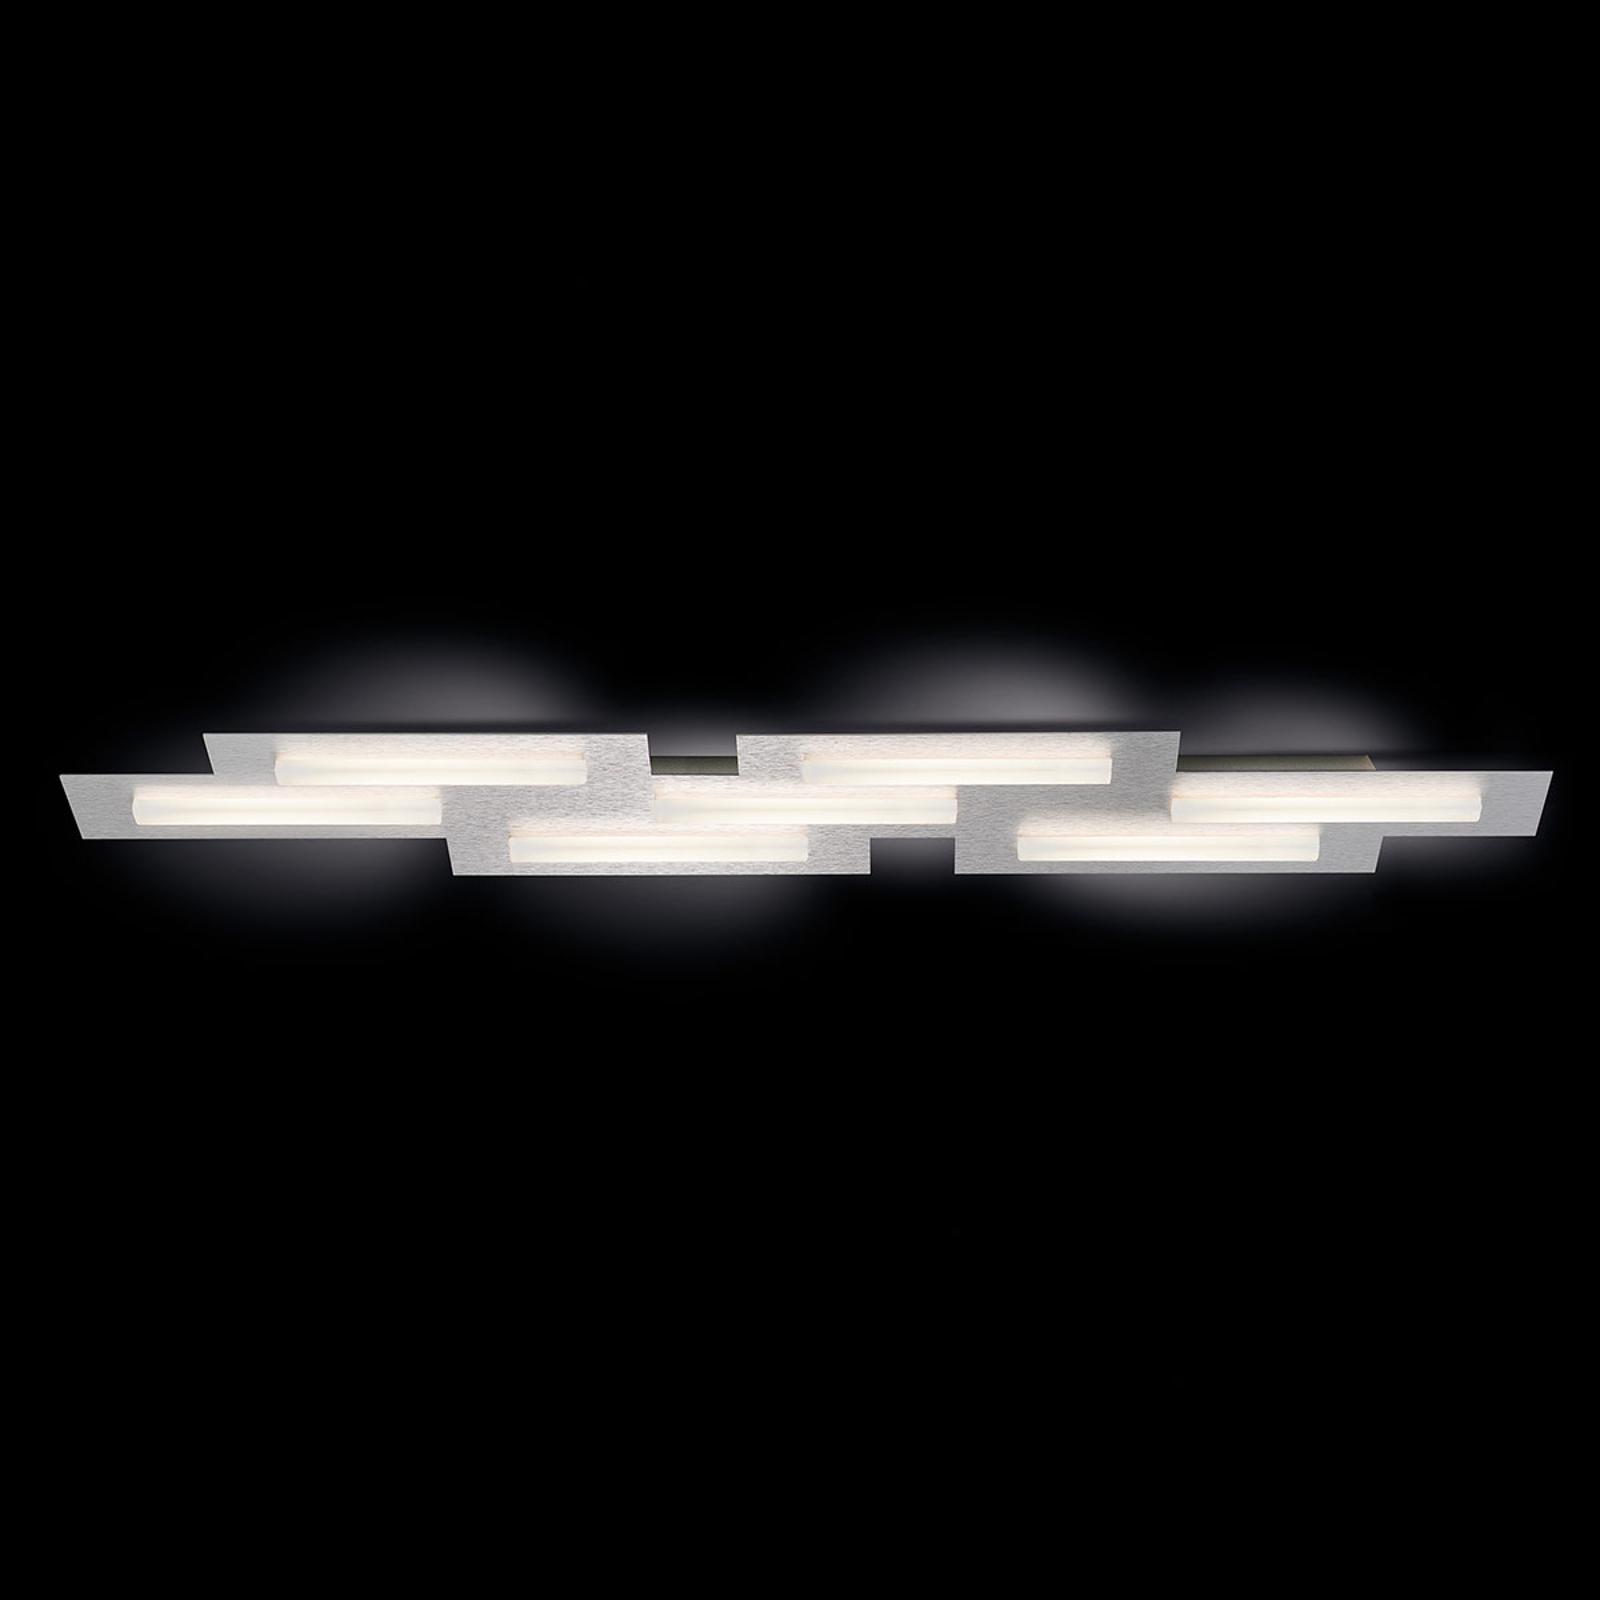 GROSSMANN Fis LED-taklampe, geometrisk form